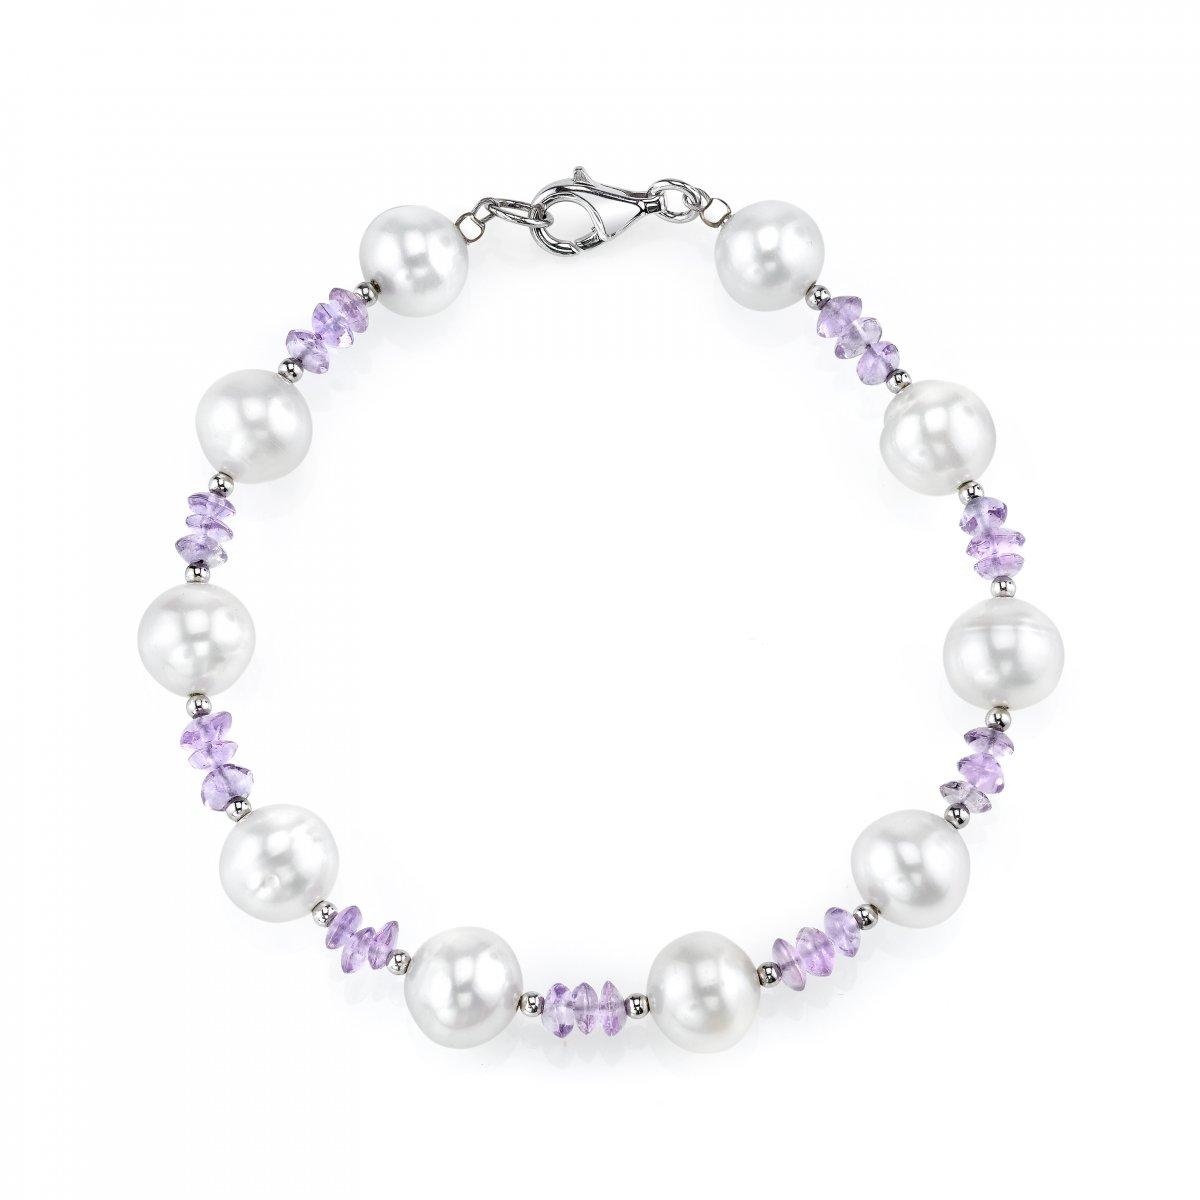 8-9mm Genuine White Freshwater Cultured Pearl & Amethyst Bracelet for Women